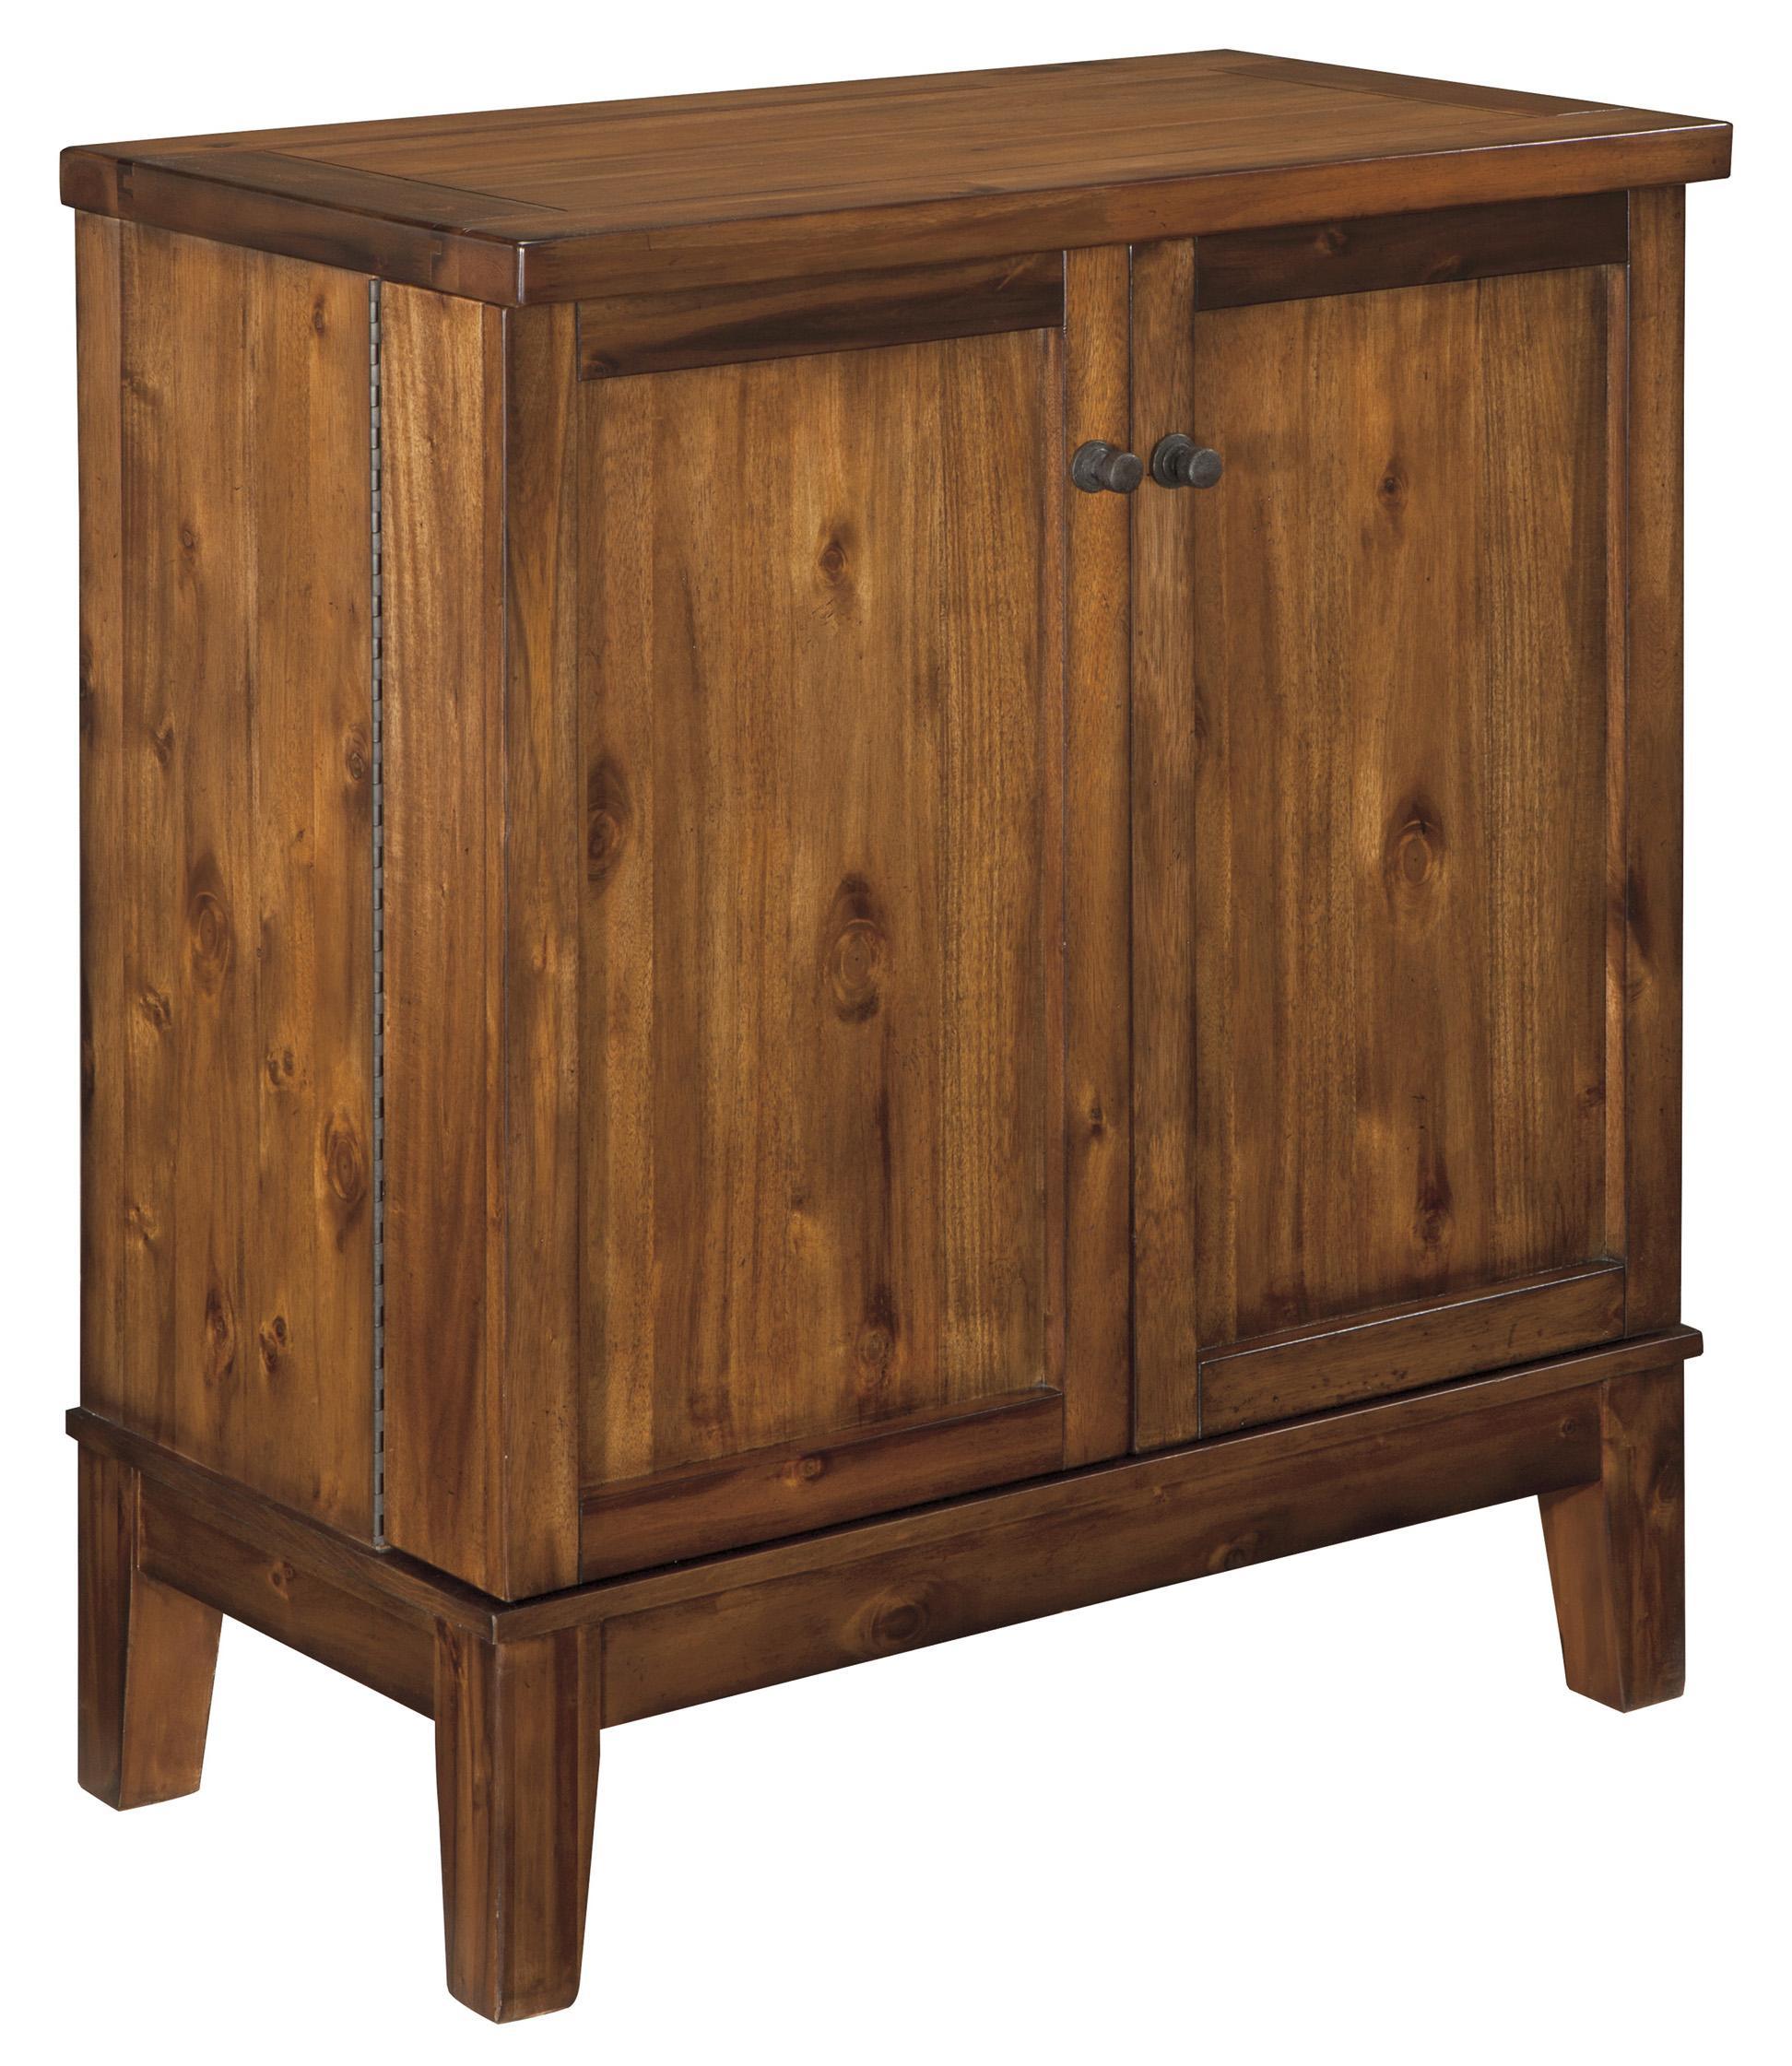 Shallibay Dining Room Server Bar Cabinet By Signature Design Ashley